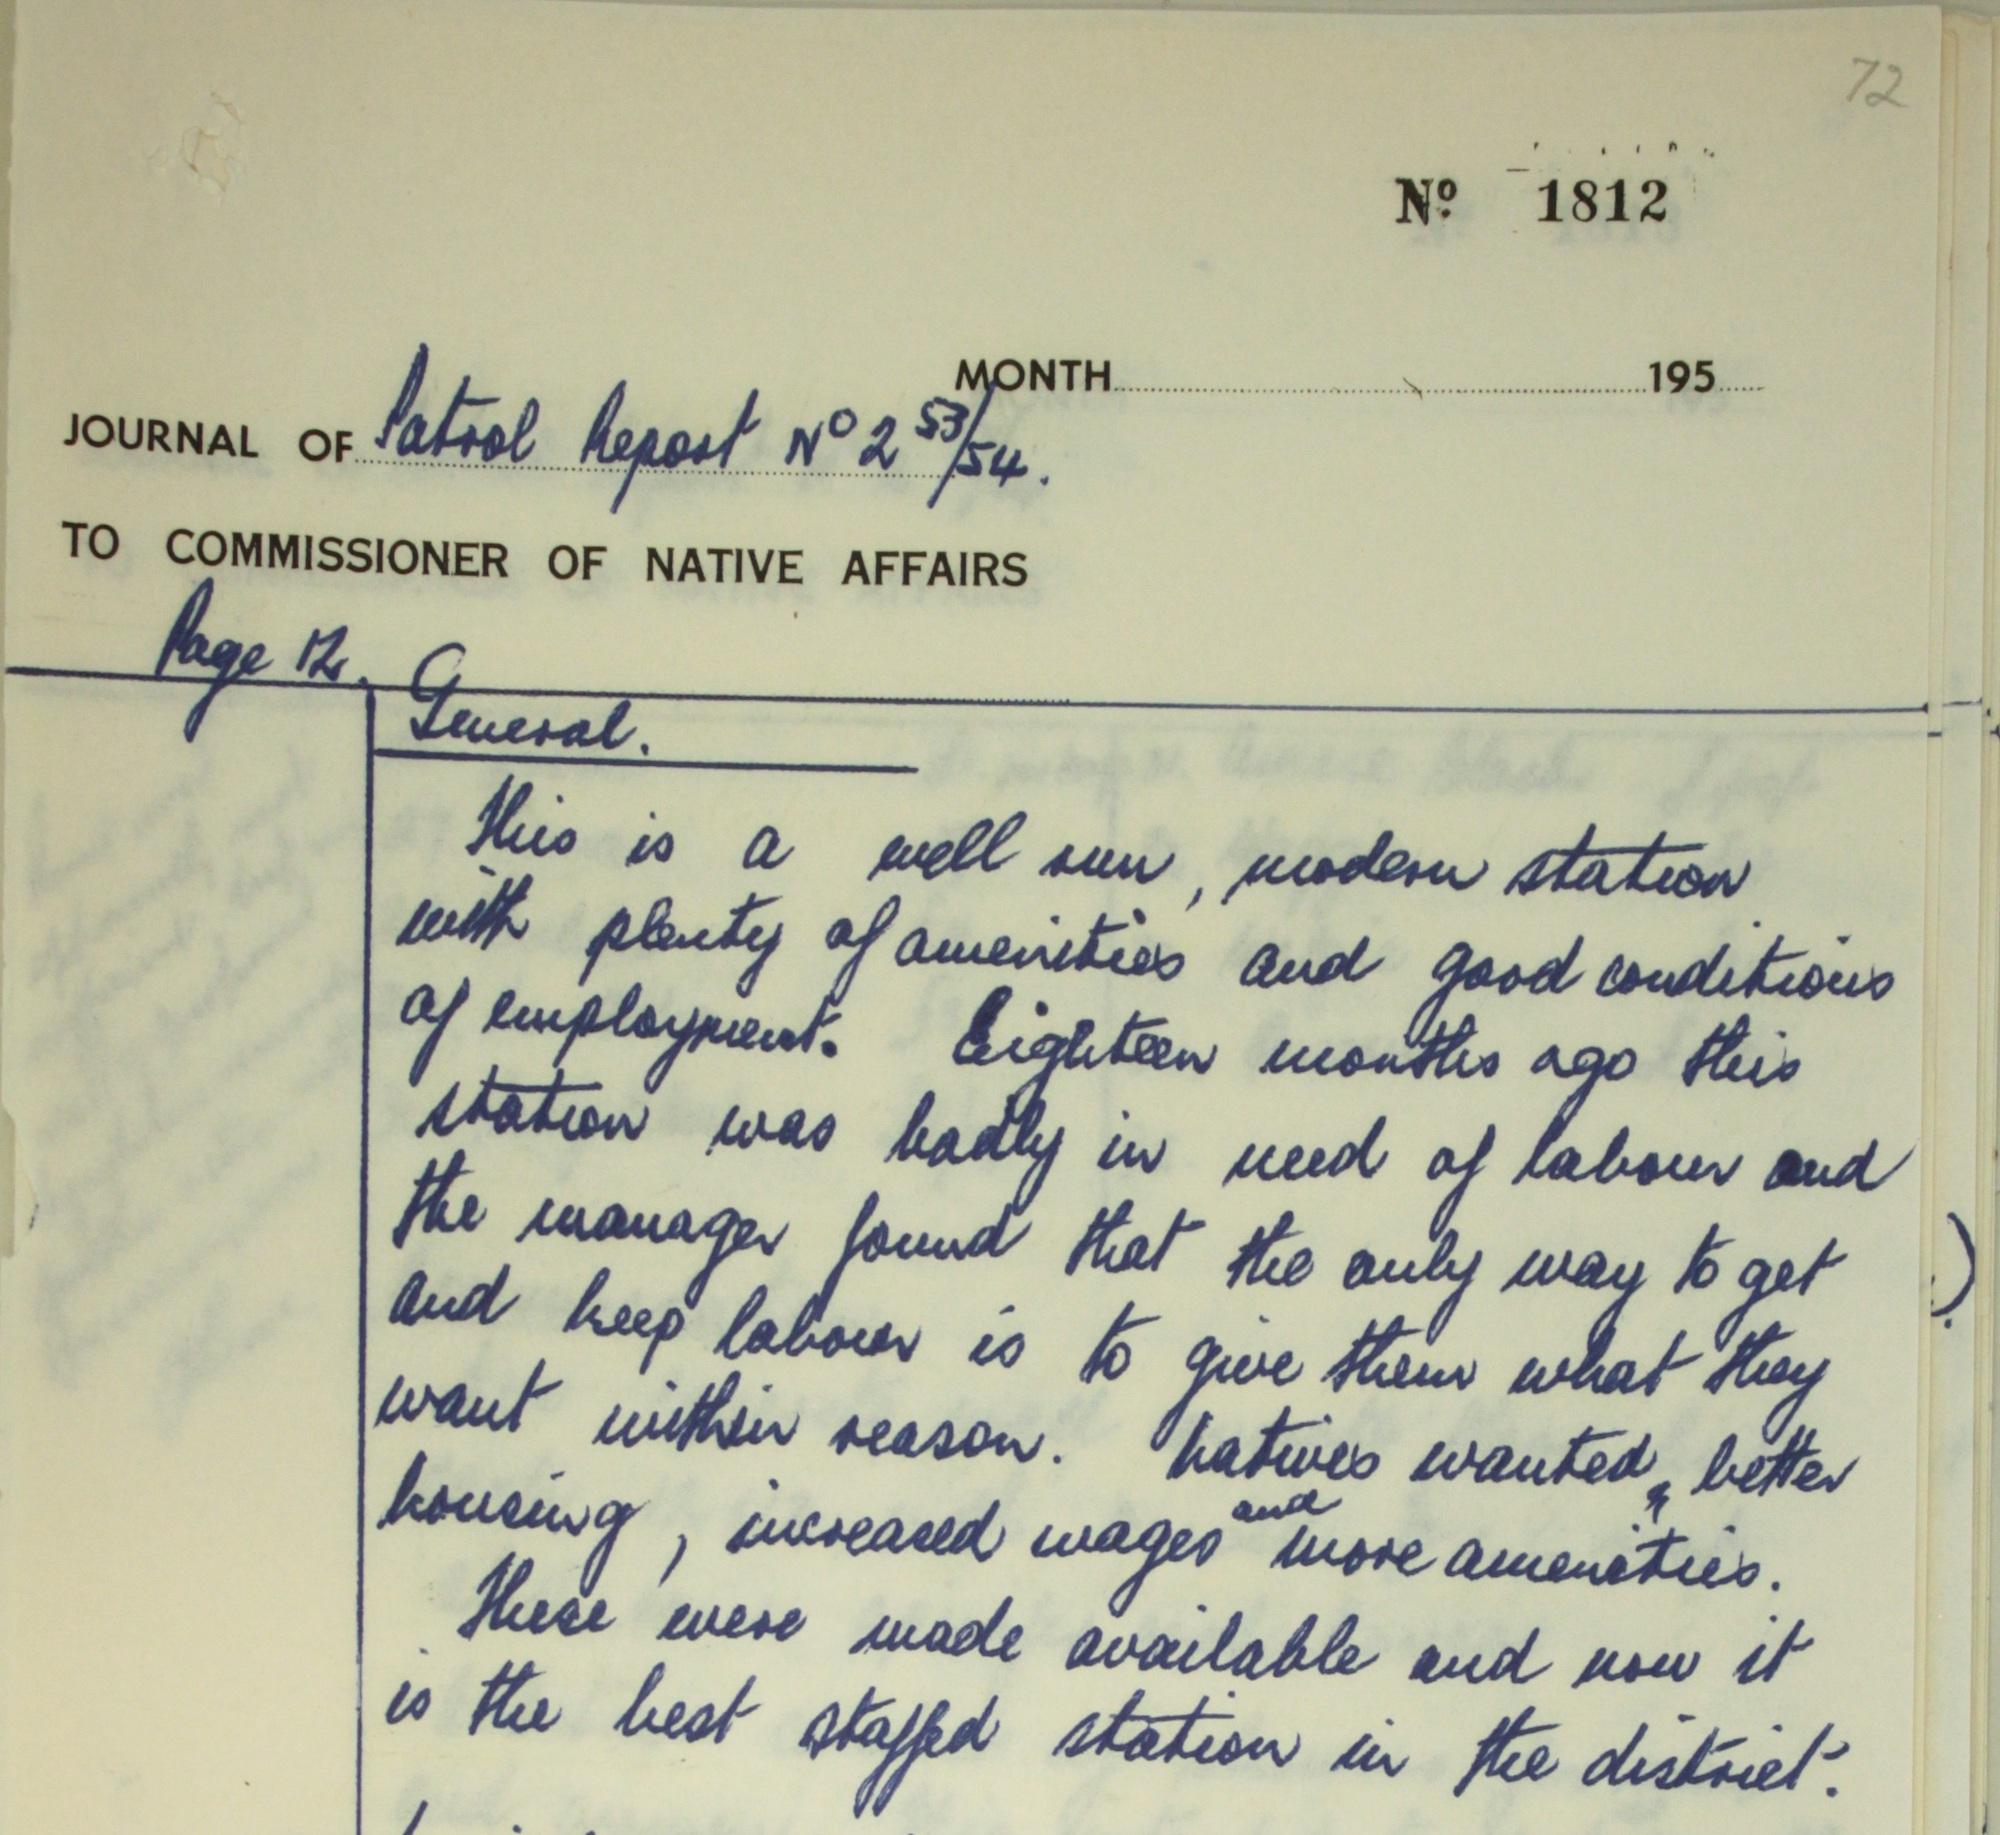 Tilbrook Native Affairs Patrol Report